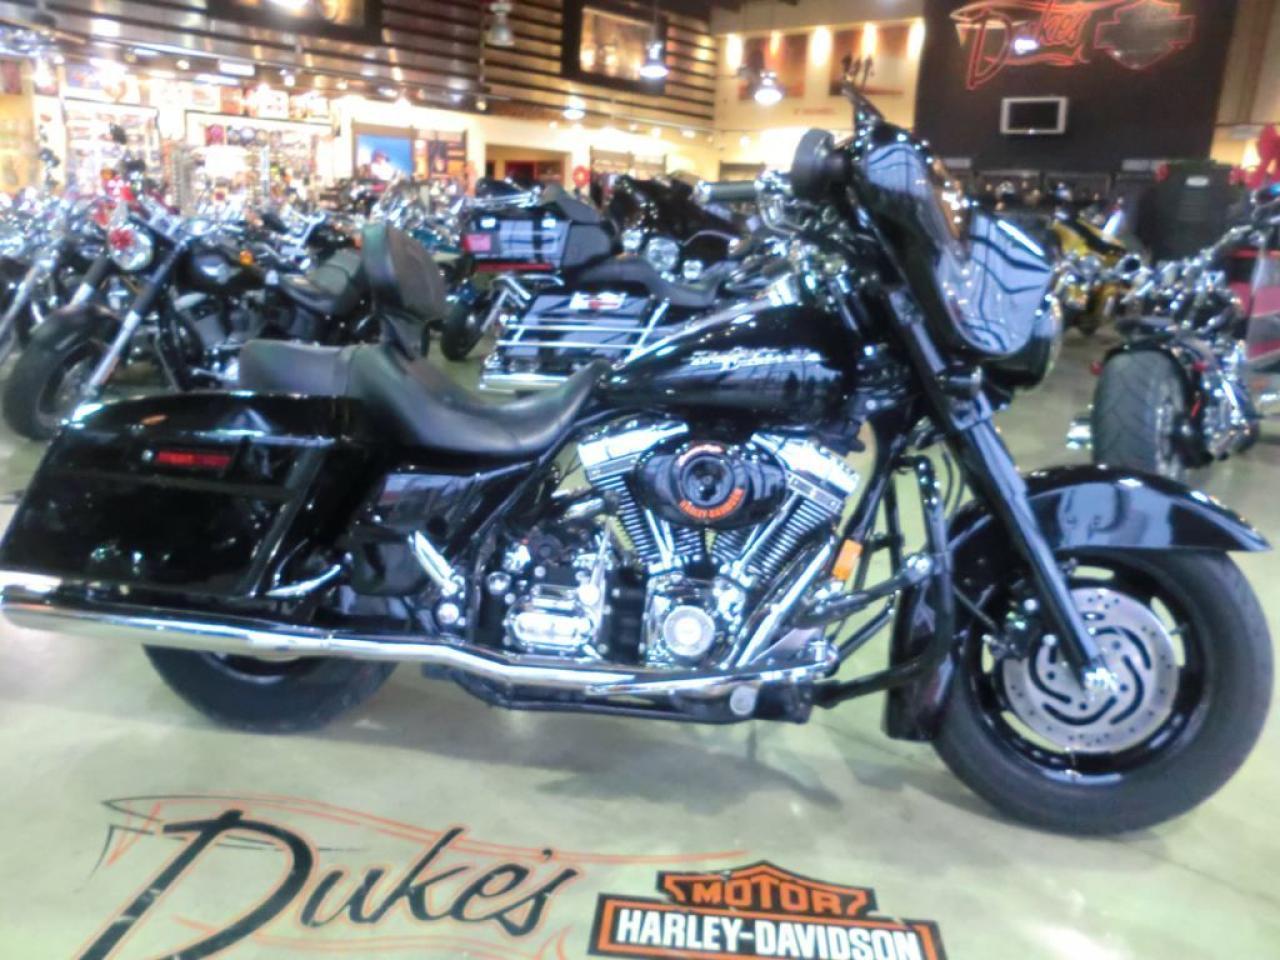 2007 Harley-Davidson Street Glide FLHX STREET GLIDE 110